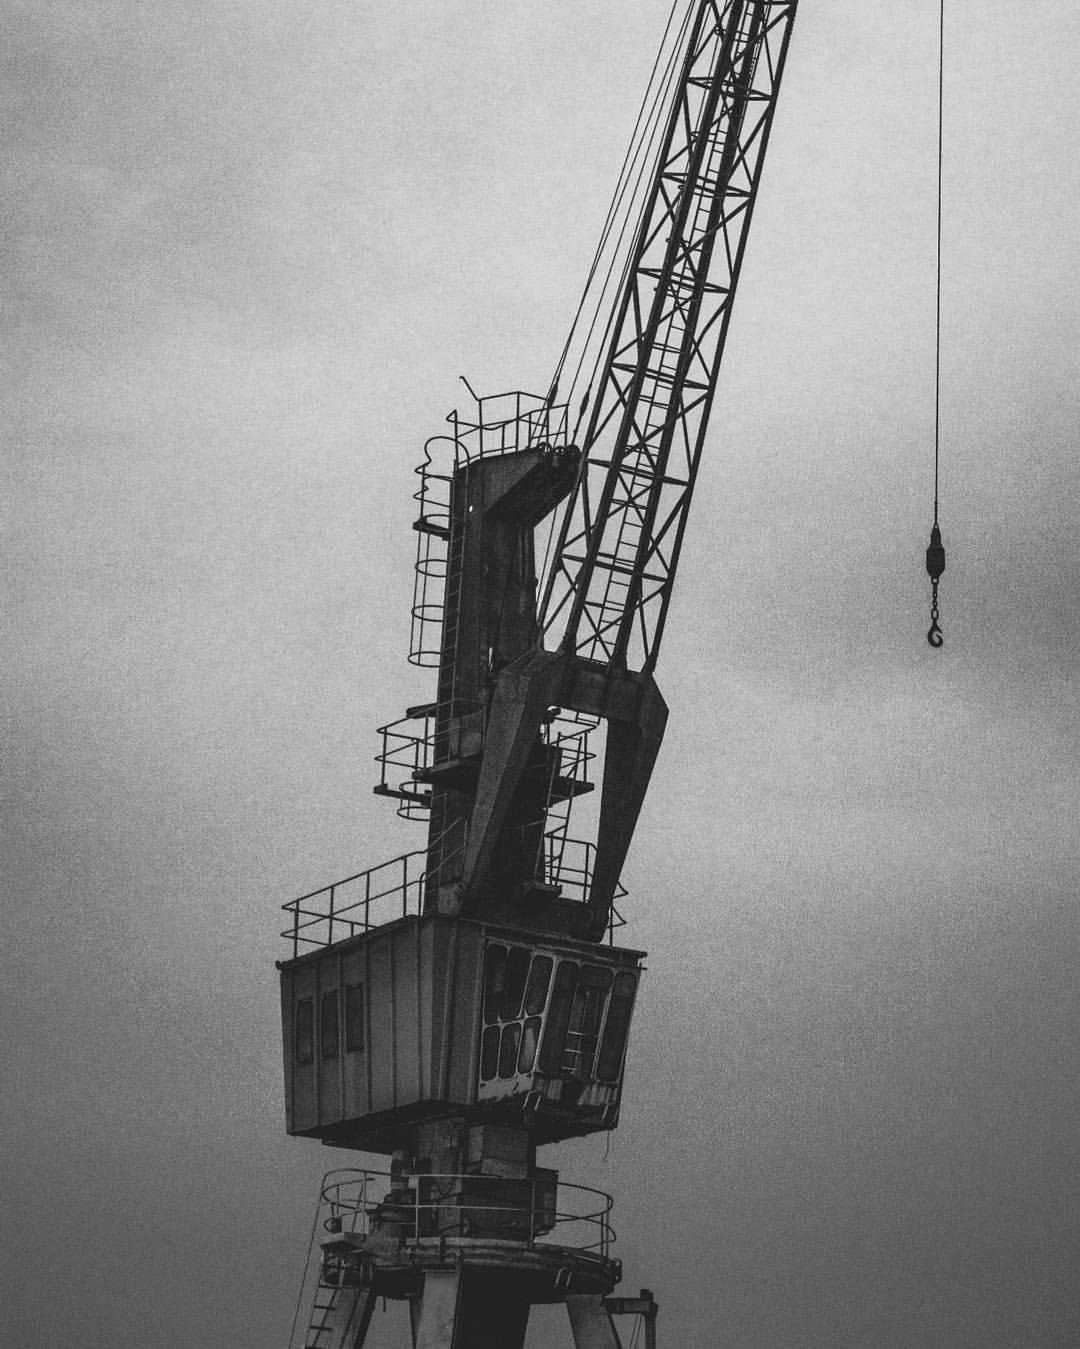 Old Crane by Marcus Menezes